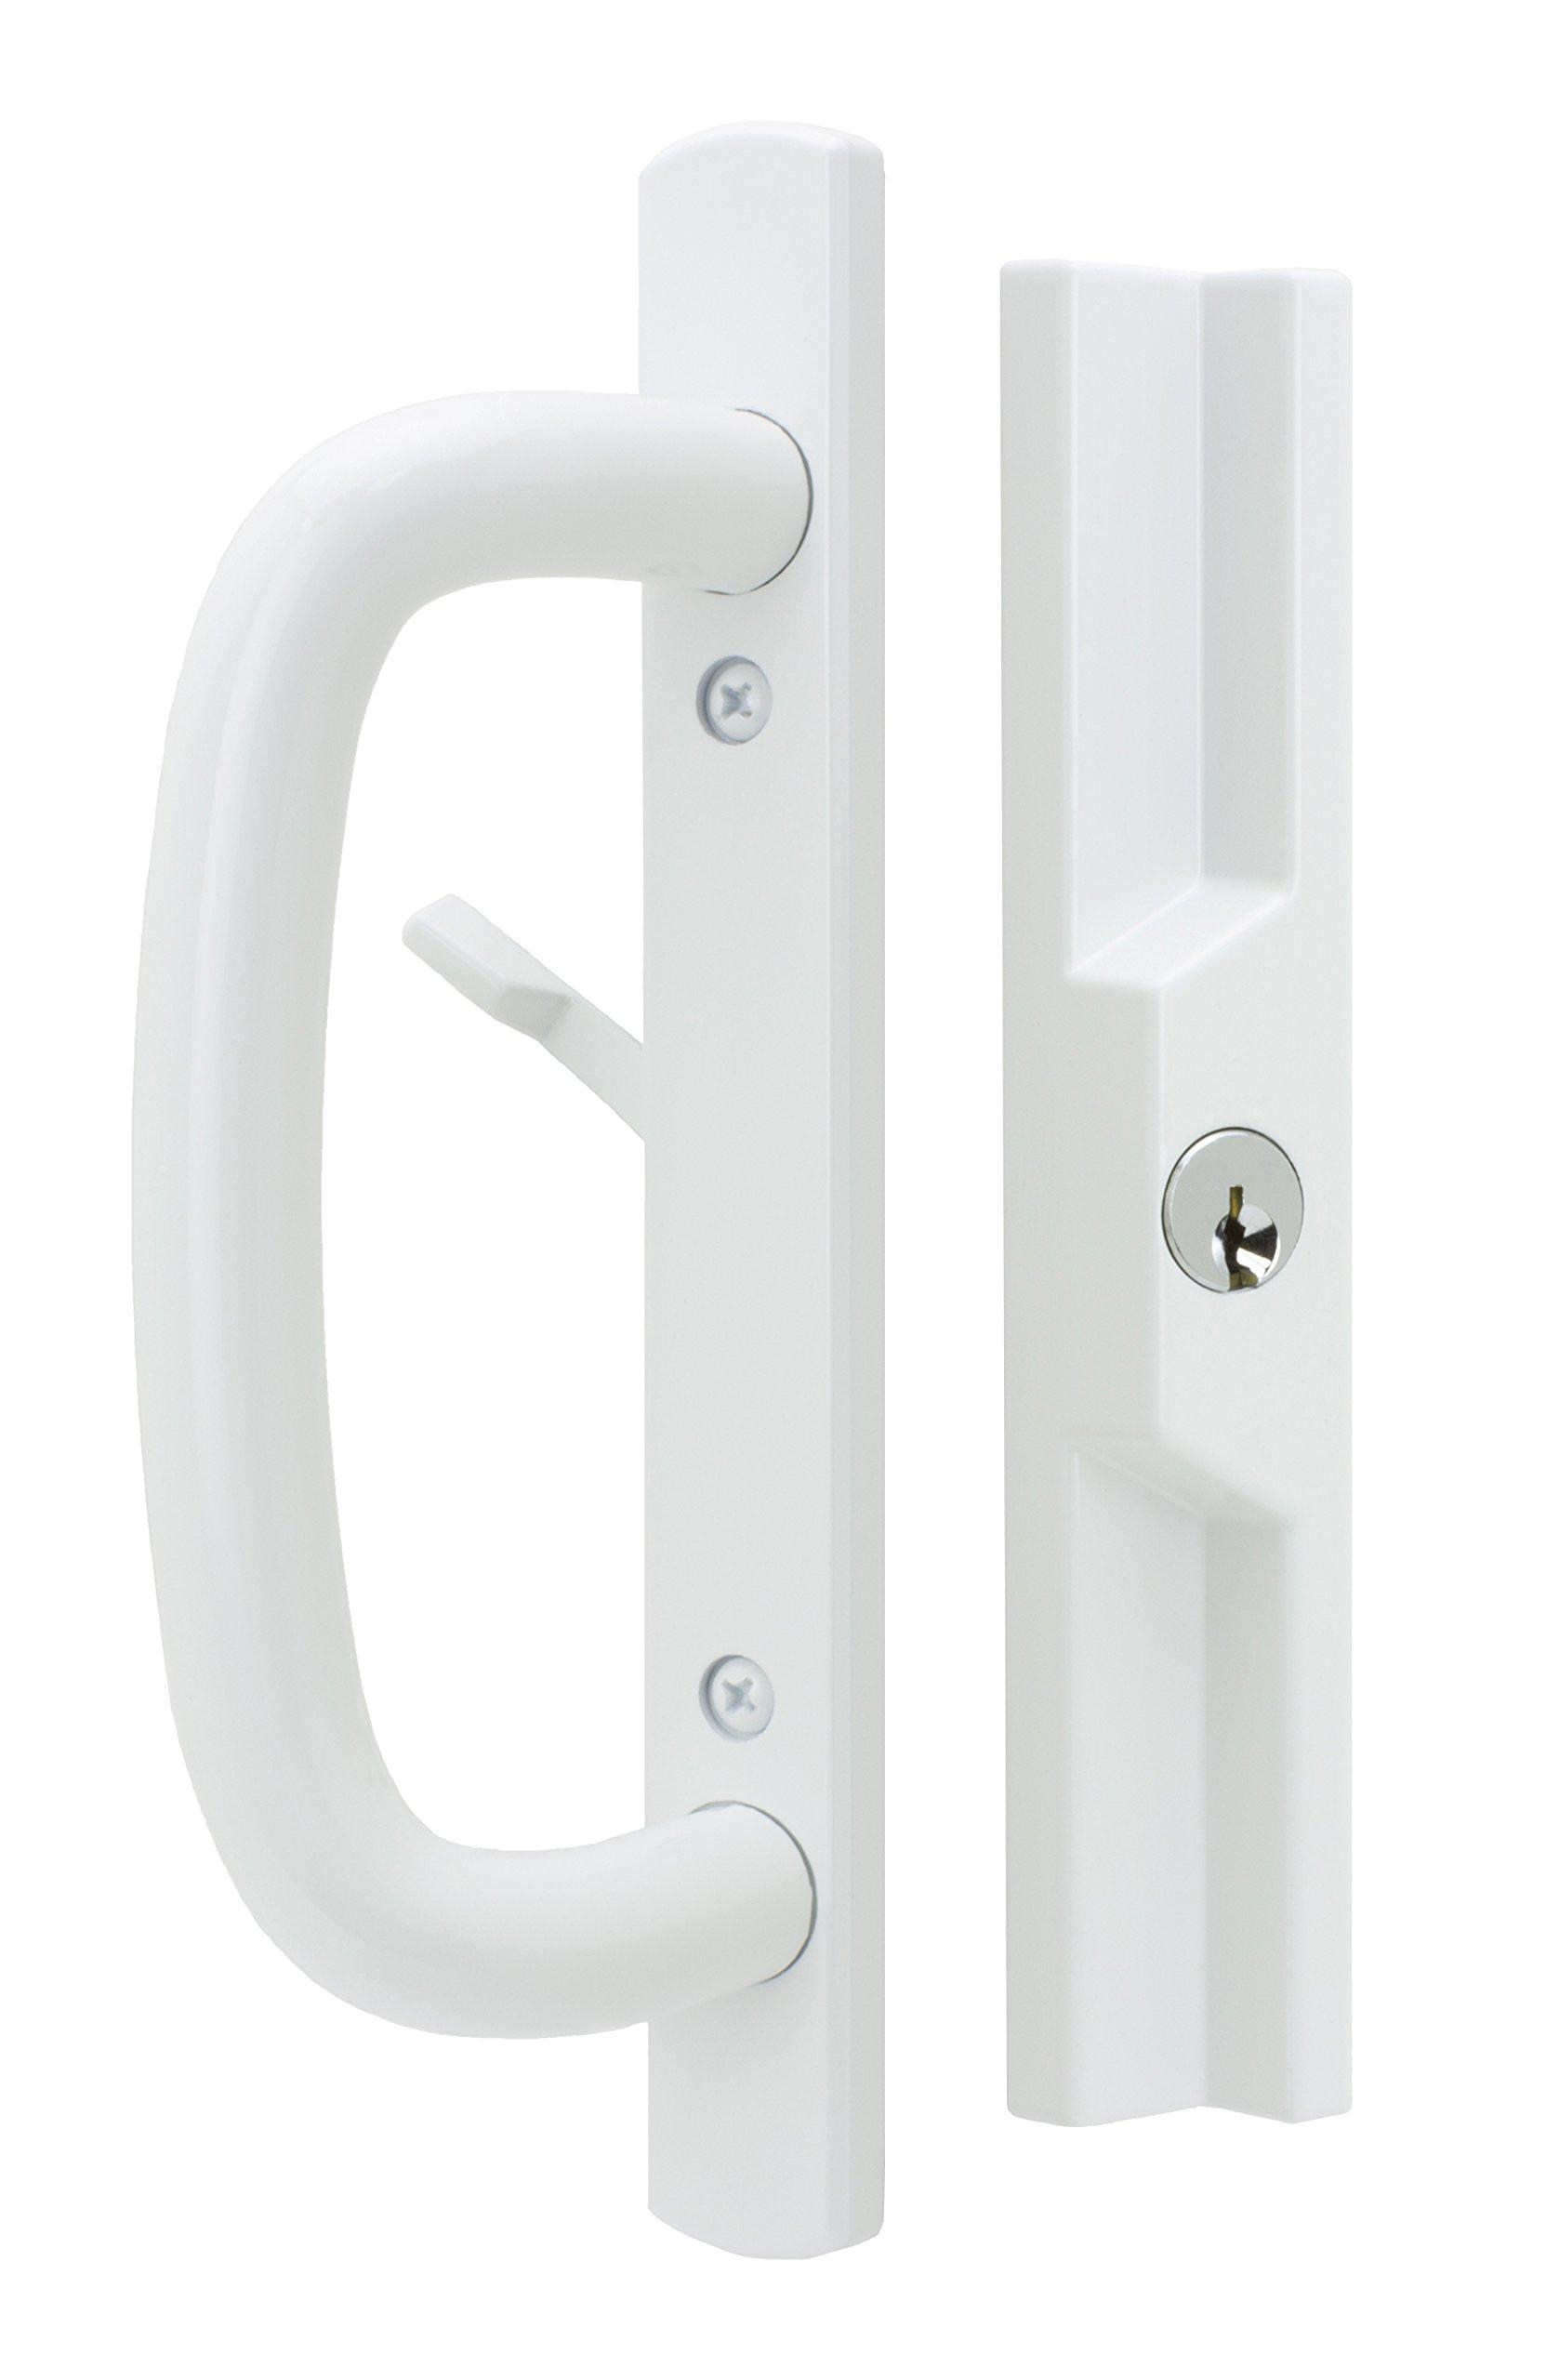 "Veranda Sliding Glass Door Handle Set with Mortise Lock, White, Keyed, 3-15/16"" Screw Holes, 1-1/2"" Door Thickness"